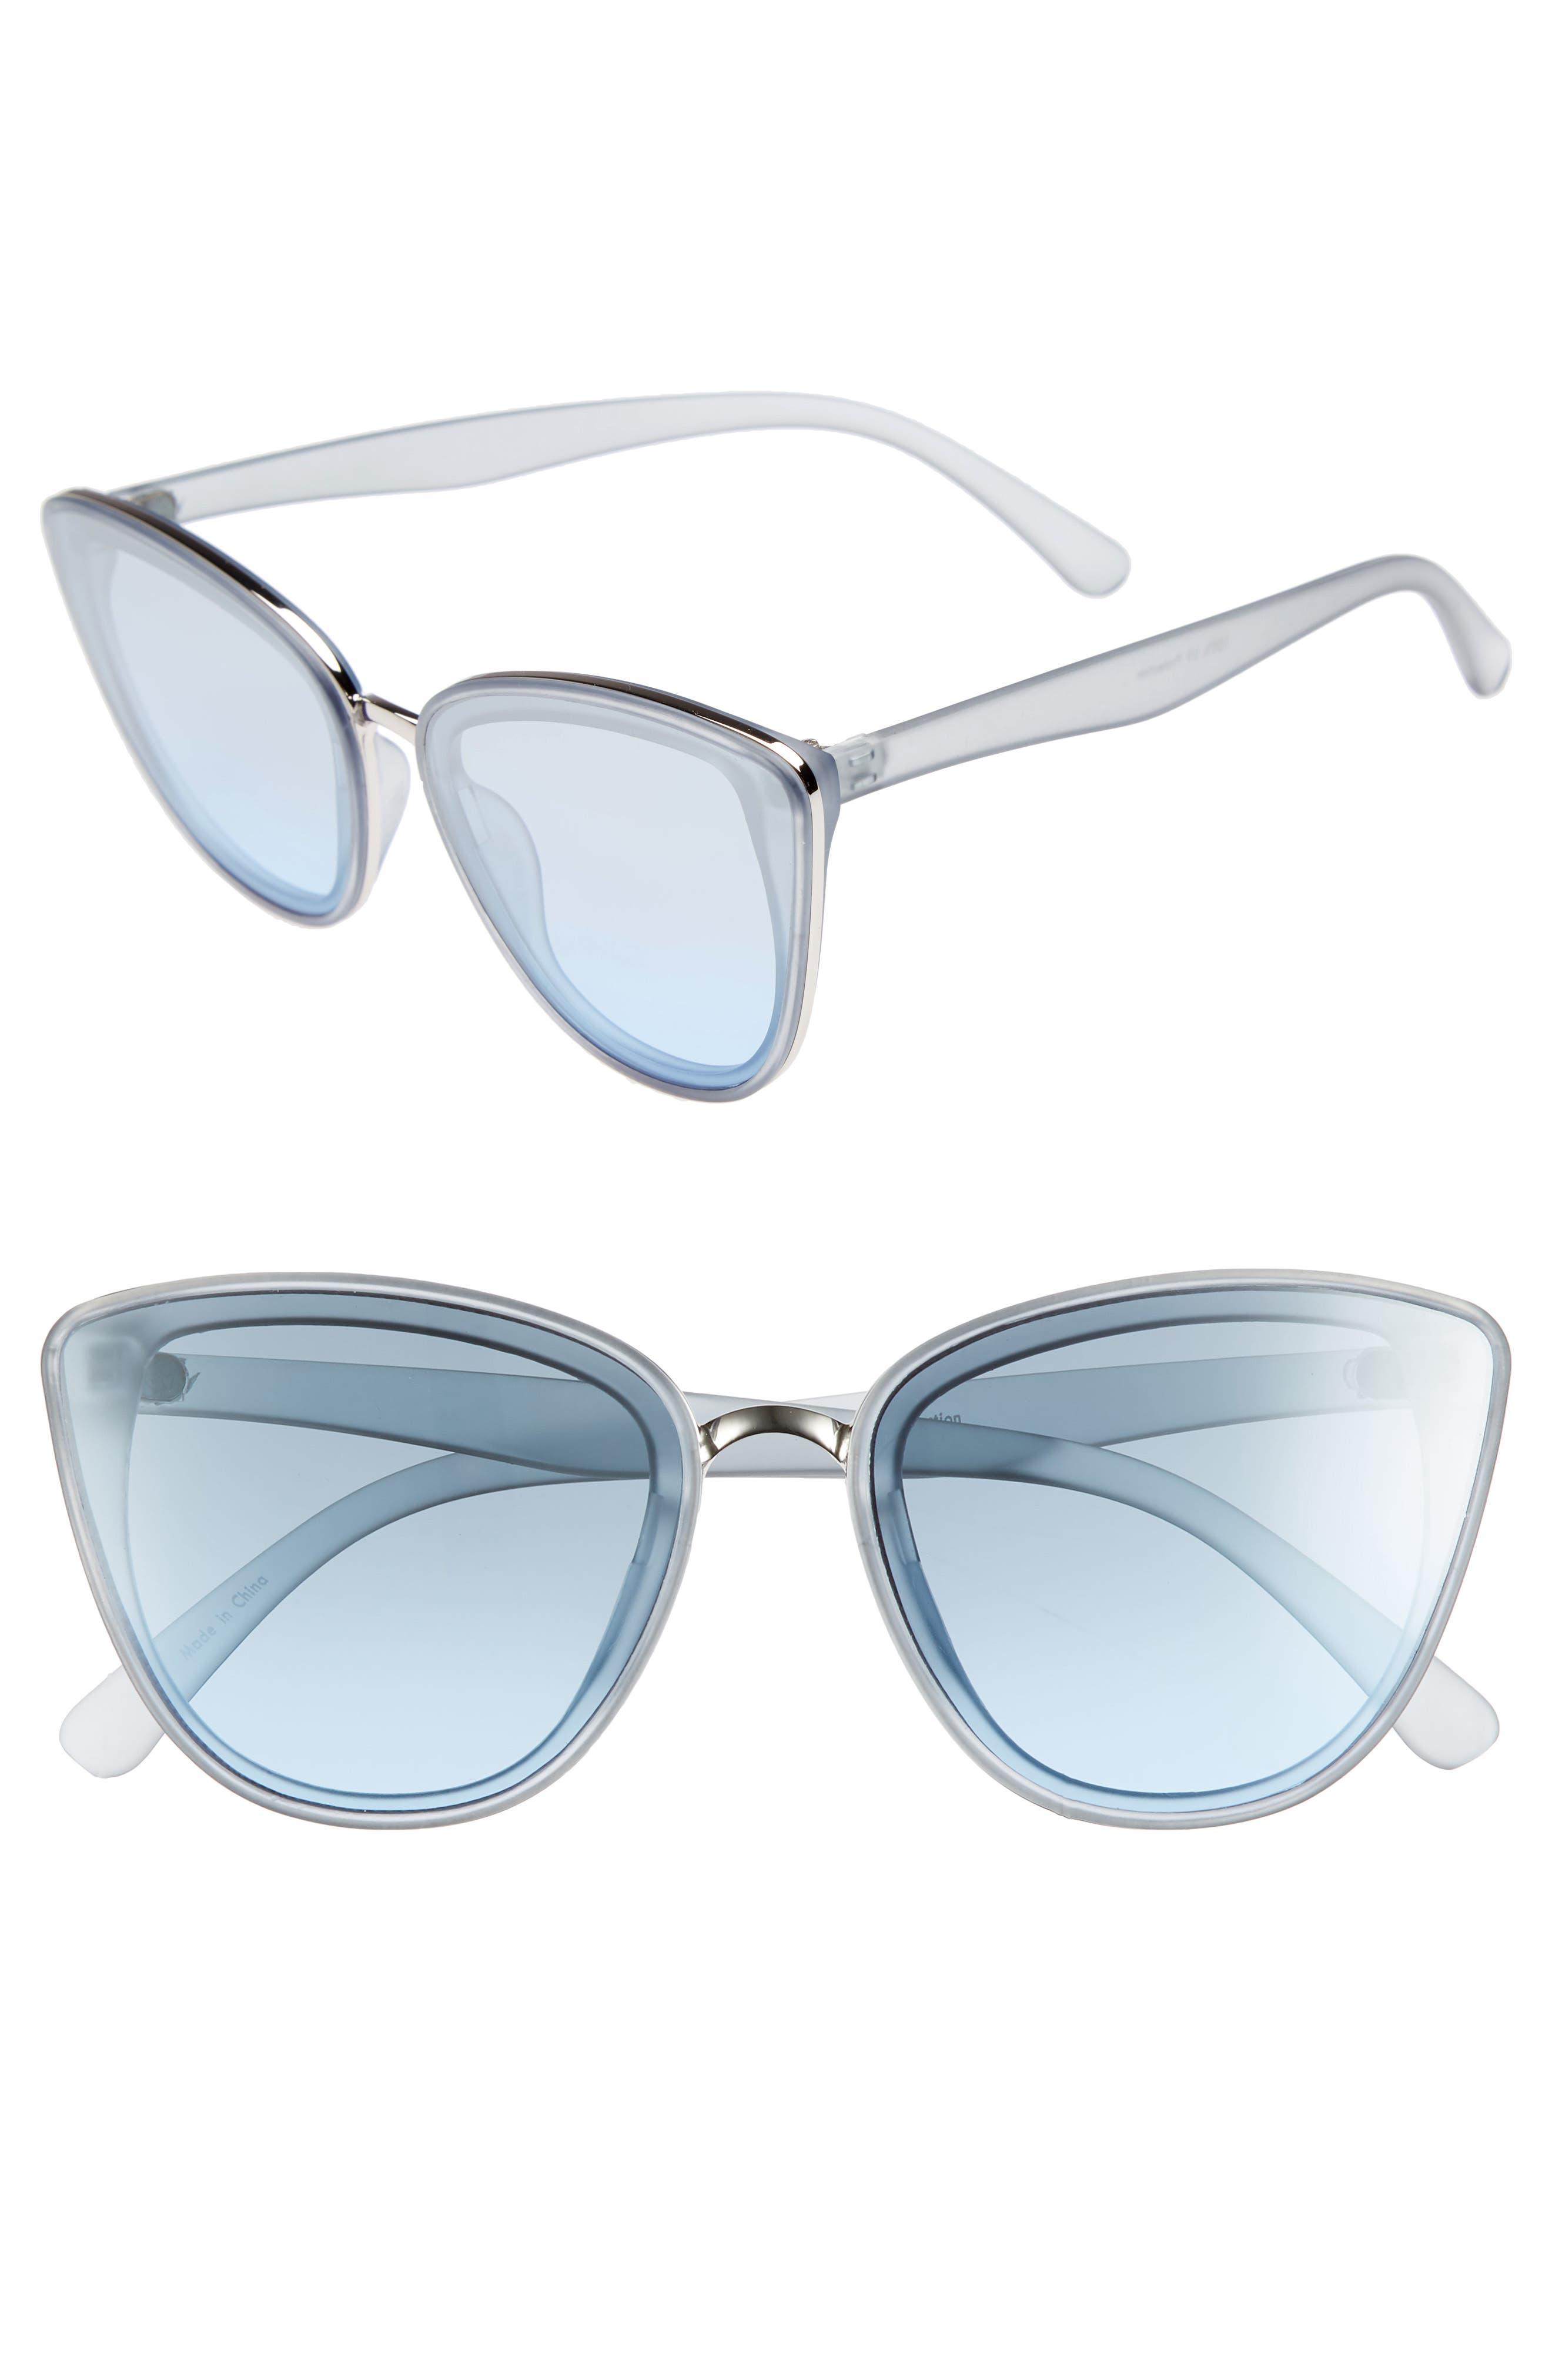 59mm Perfect Cat Eye Sunglasses,                             Main thumbnail 1, color,                             Blue/ Blue